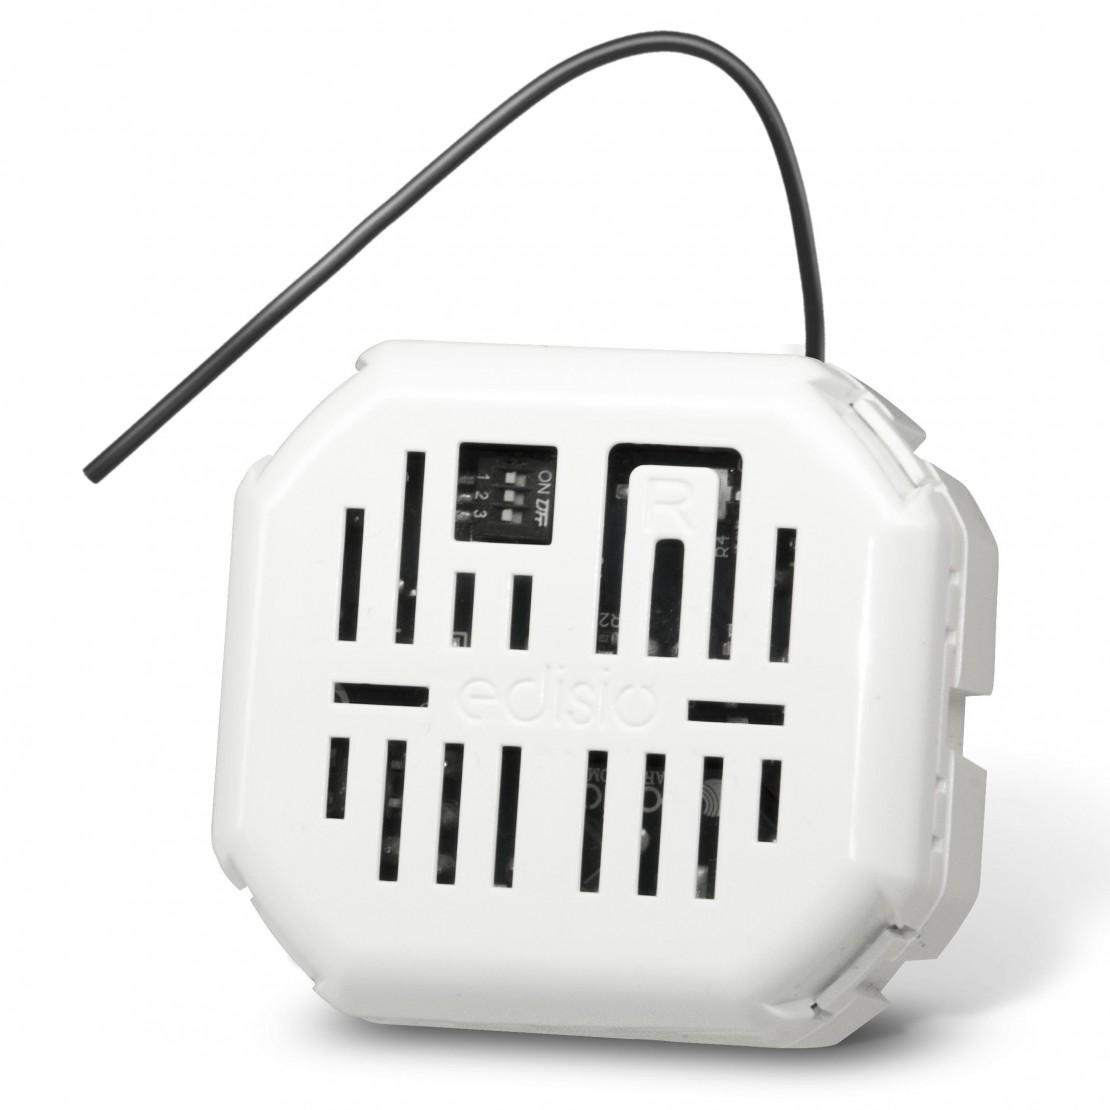 Dimmer transmitter/receiver micro-module